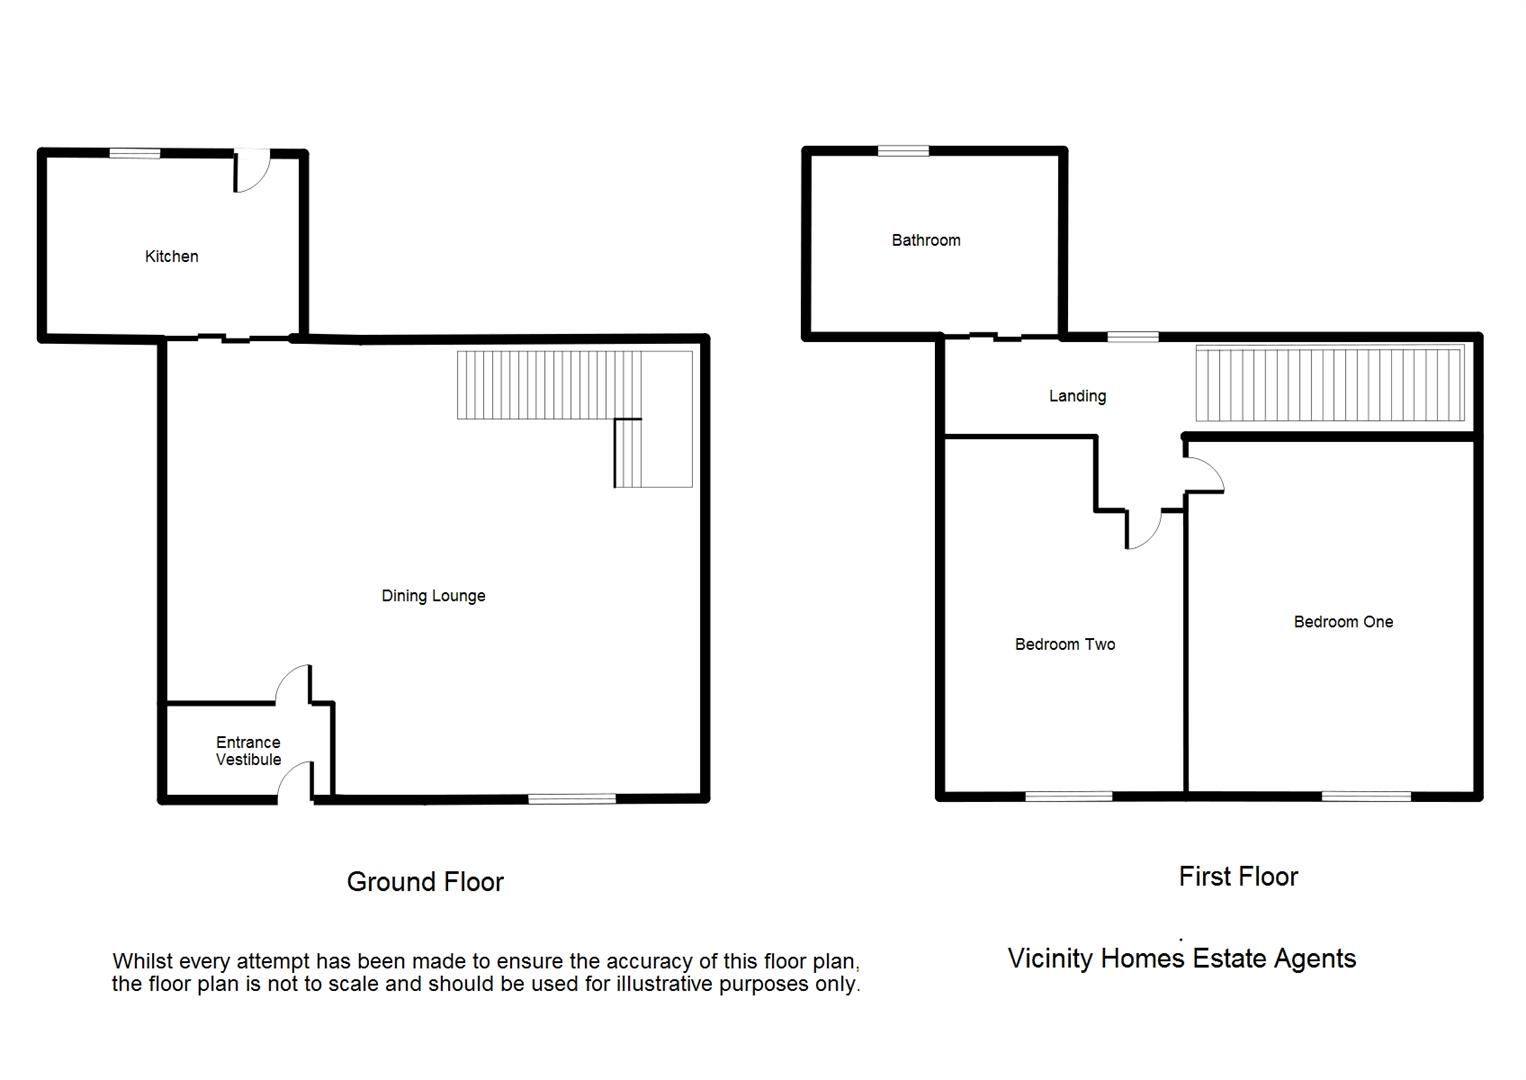 Home On Sale 5 Silloth Street Carlisle 70,000